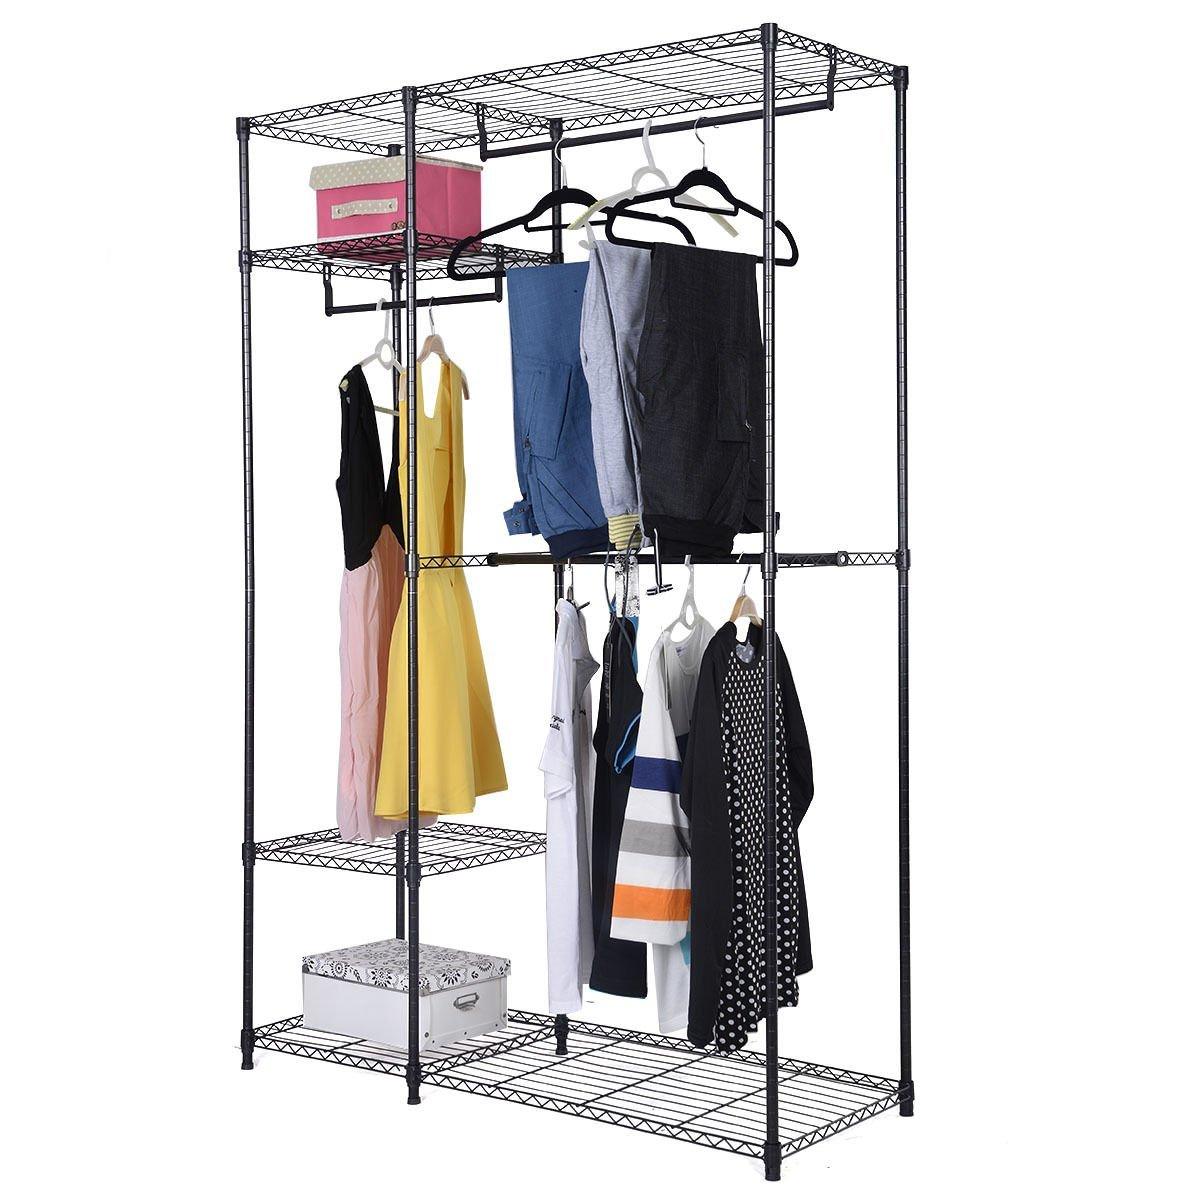 Safstar Portable Clothes Wardrobe Garment Rack Home Closet